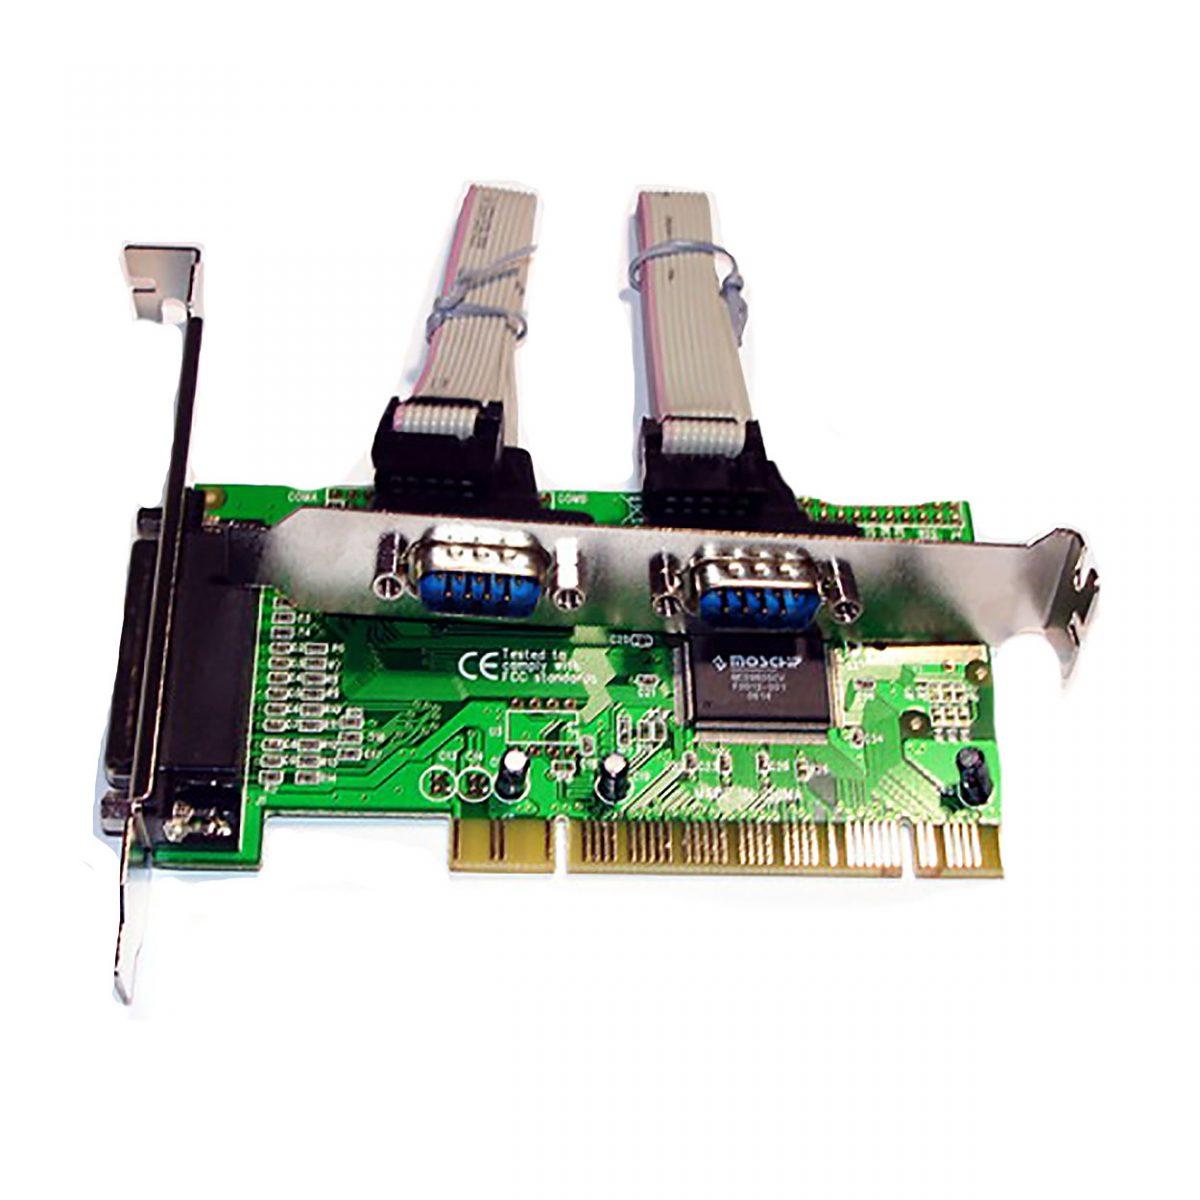 Контроллер PCI, 2xCOM 9m 1 LPT MCS9835CV